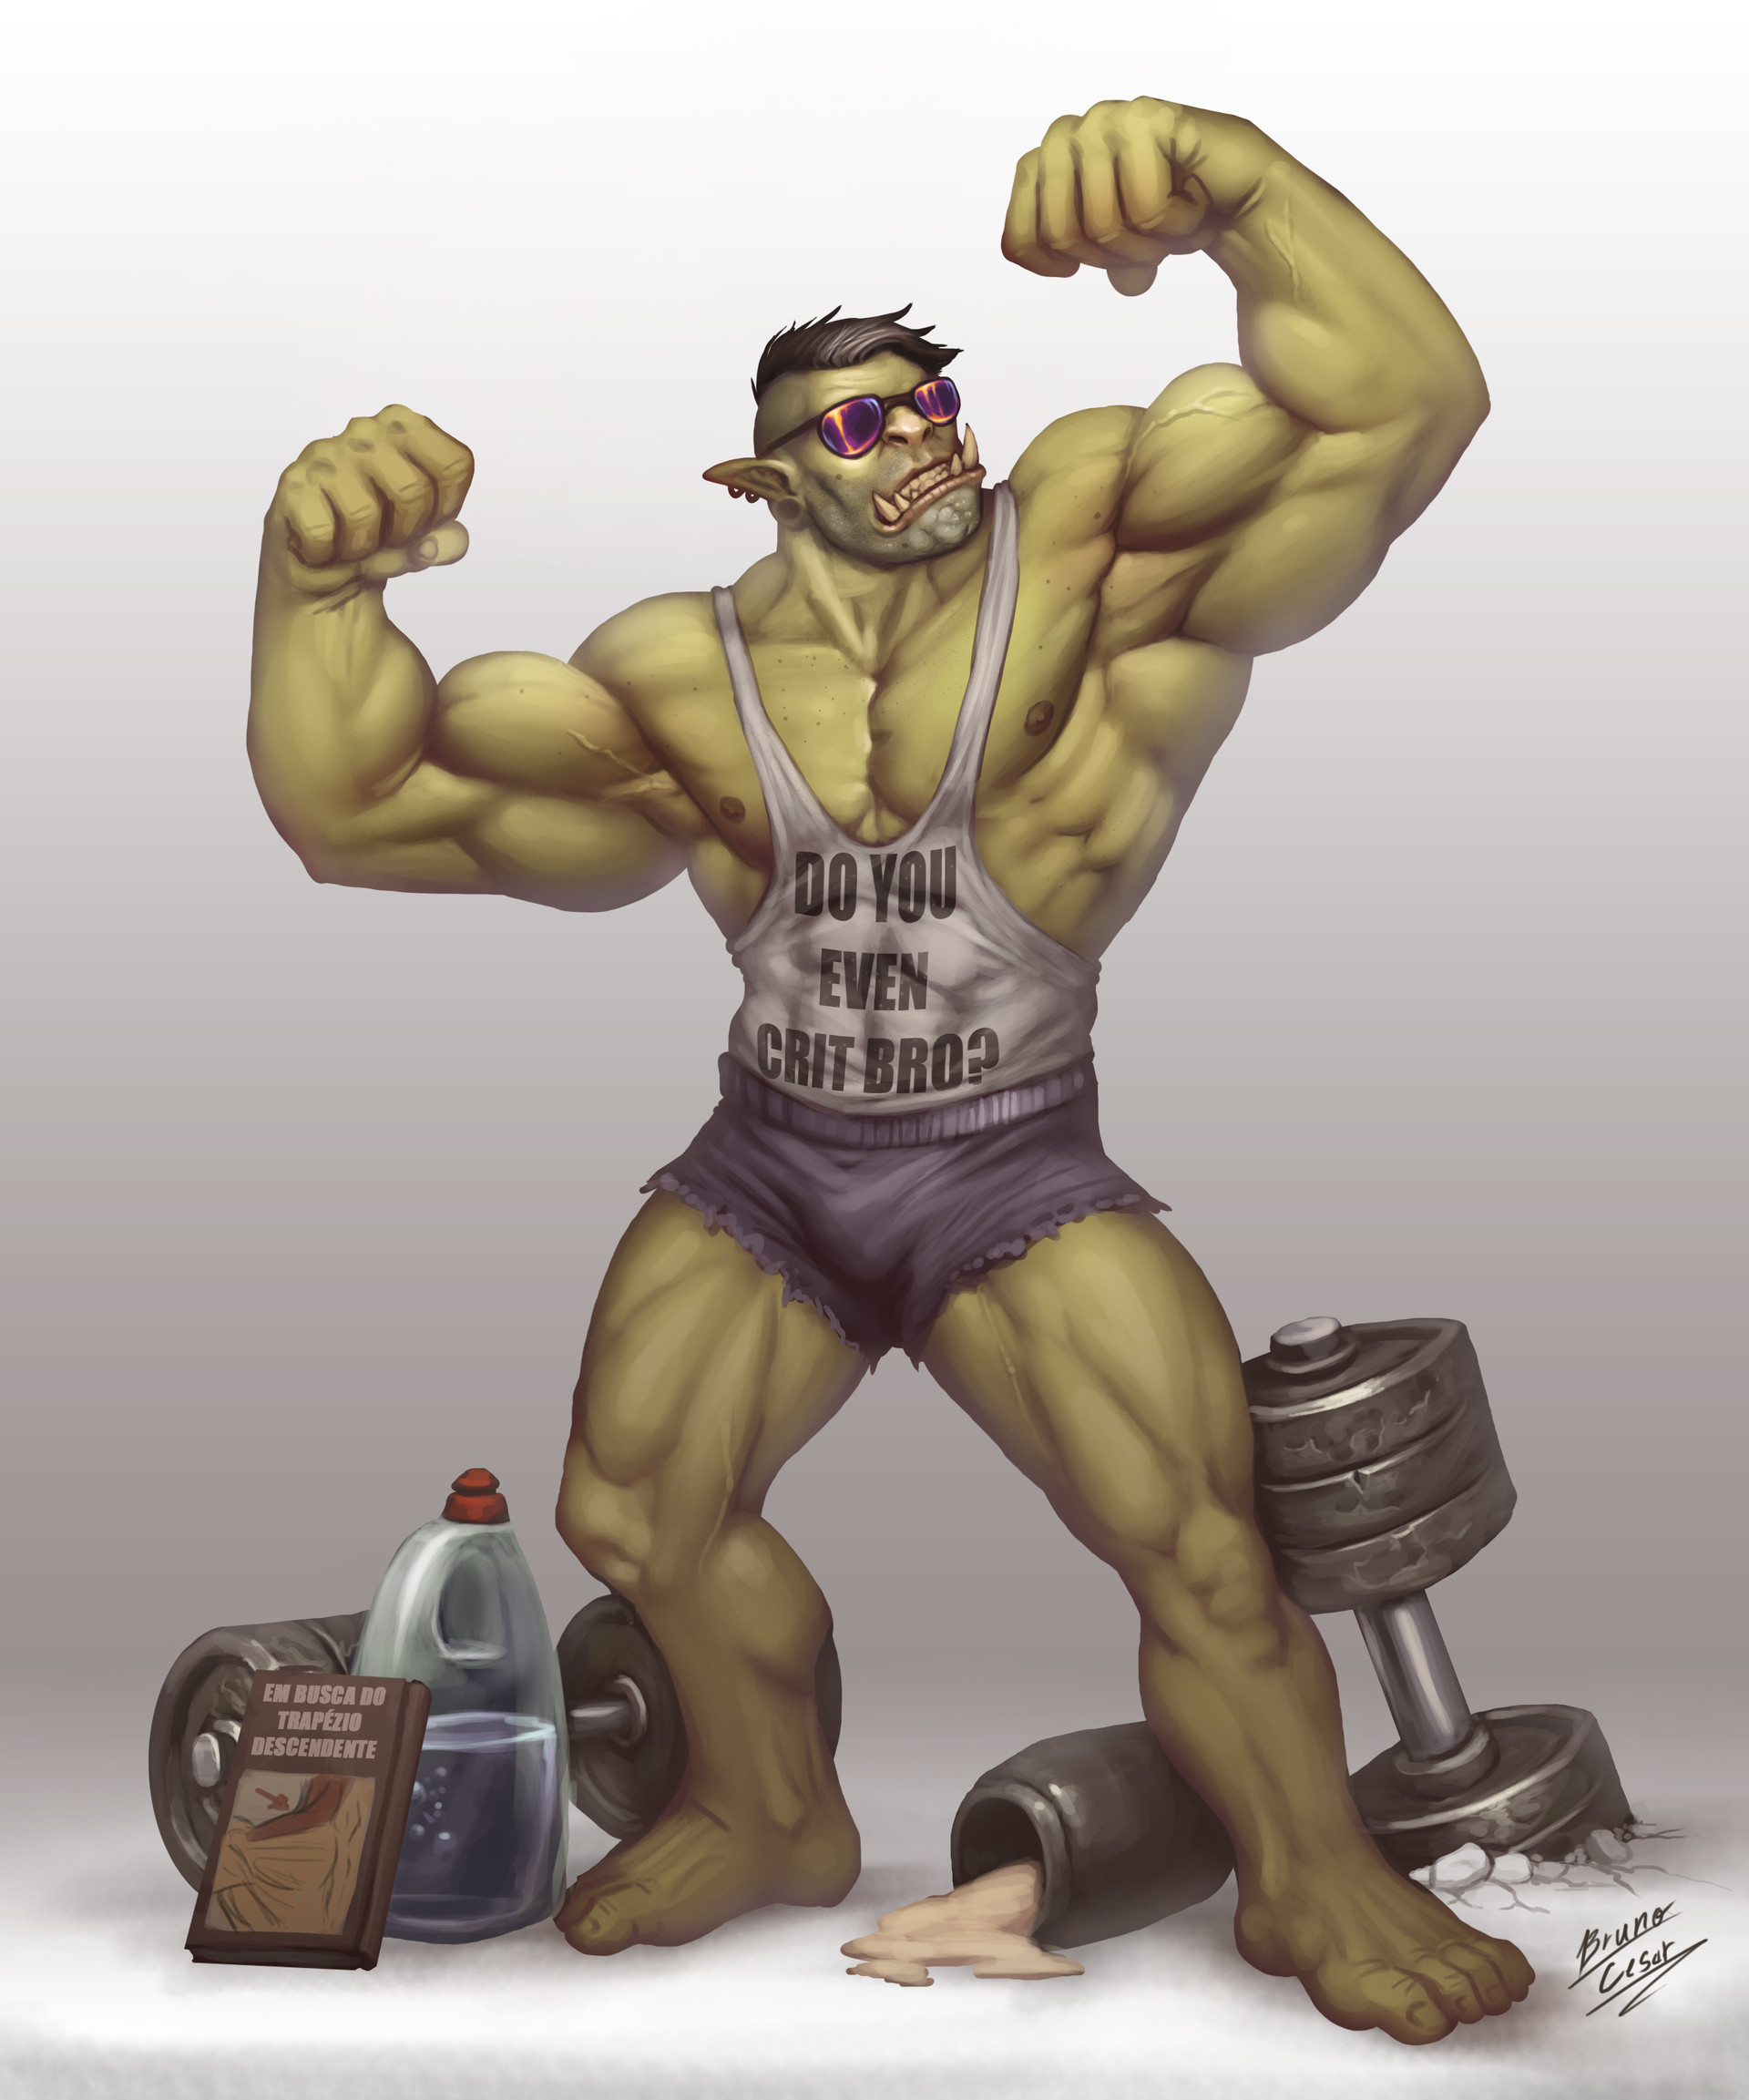 Bruno cesar 01 bodybuilder